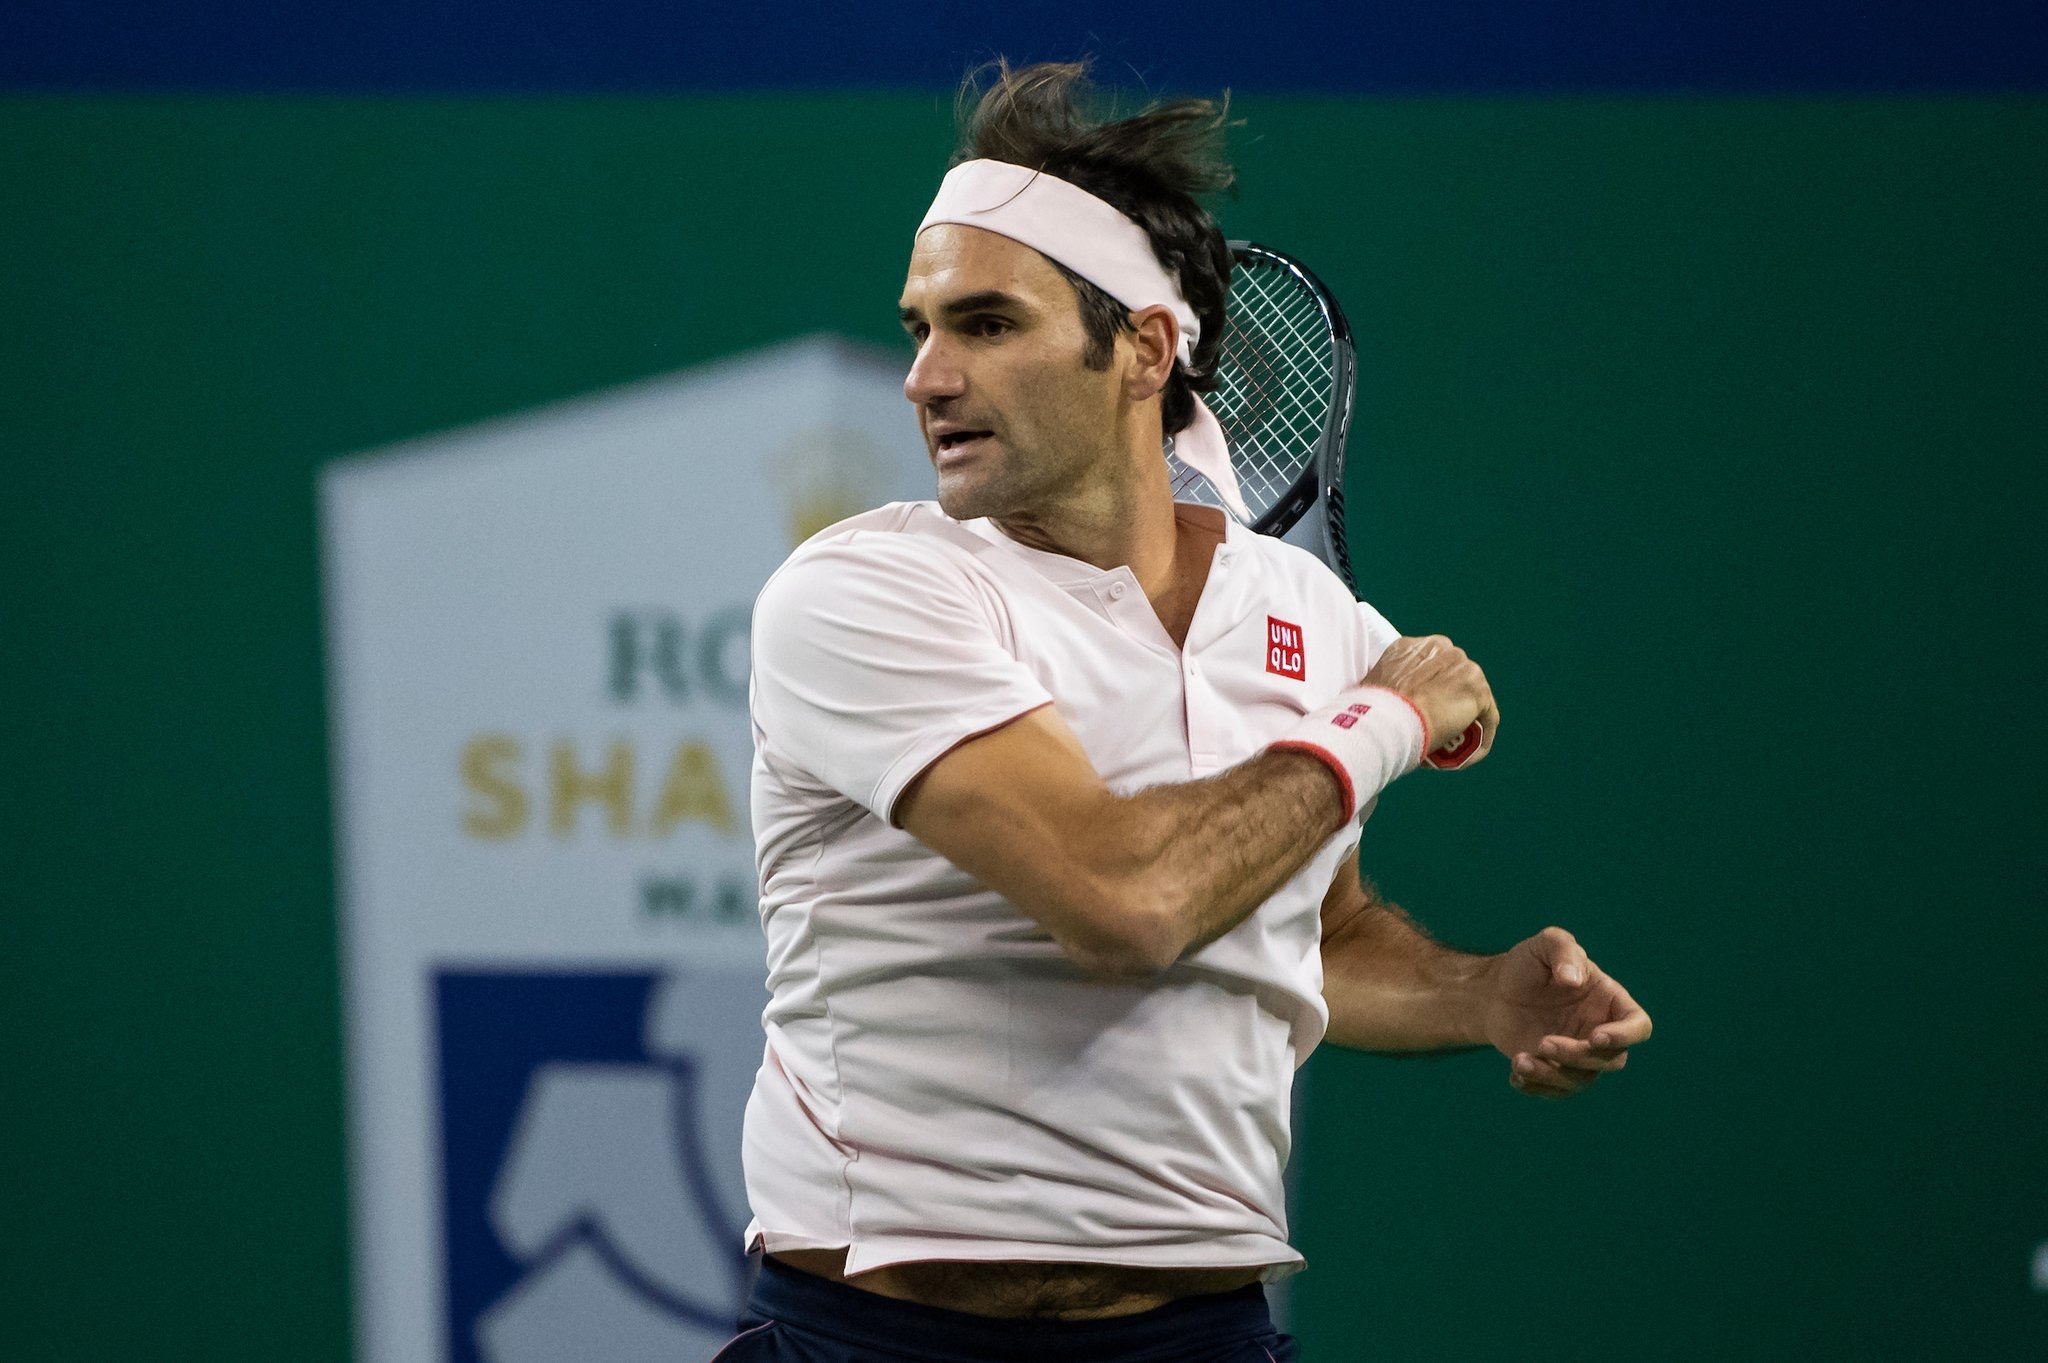 Federer Overcomes Nishikori to Reach Shanghai Masters Semifinals